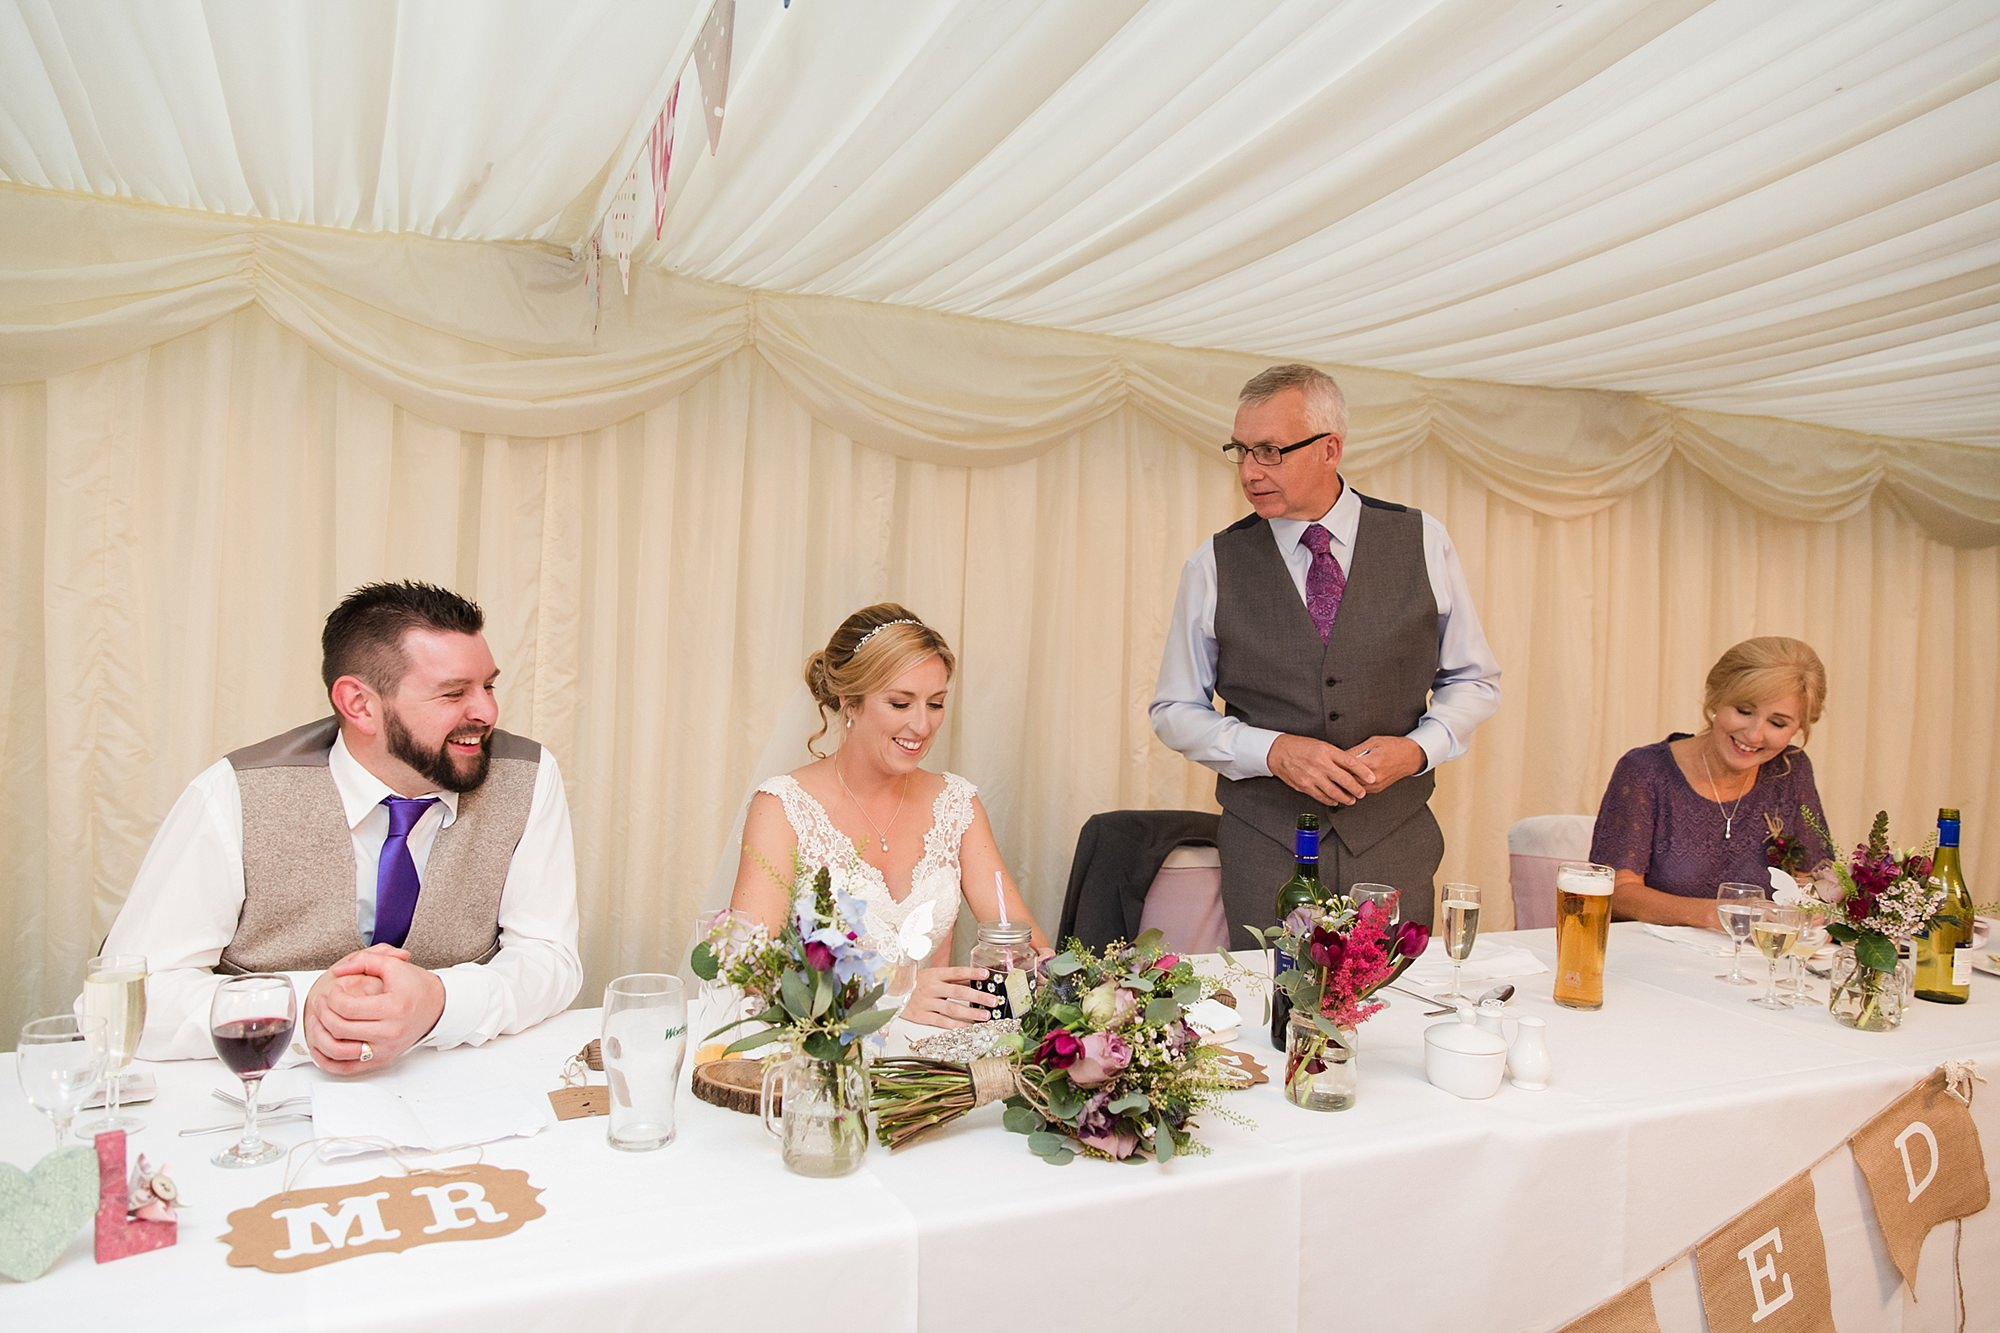 A fun wedding at Plas Isaffather of bride speech